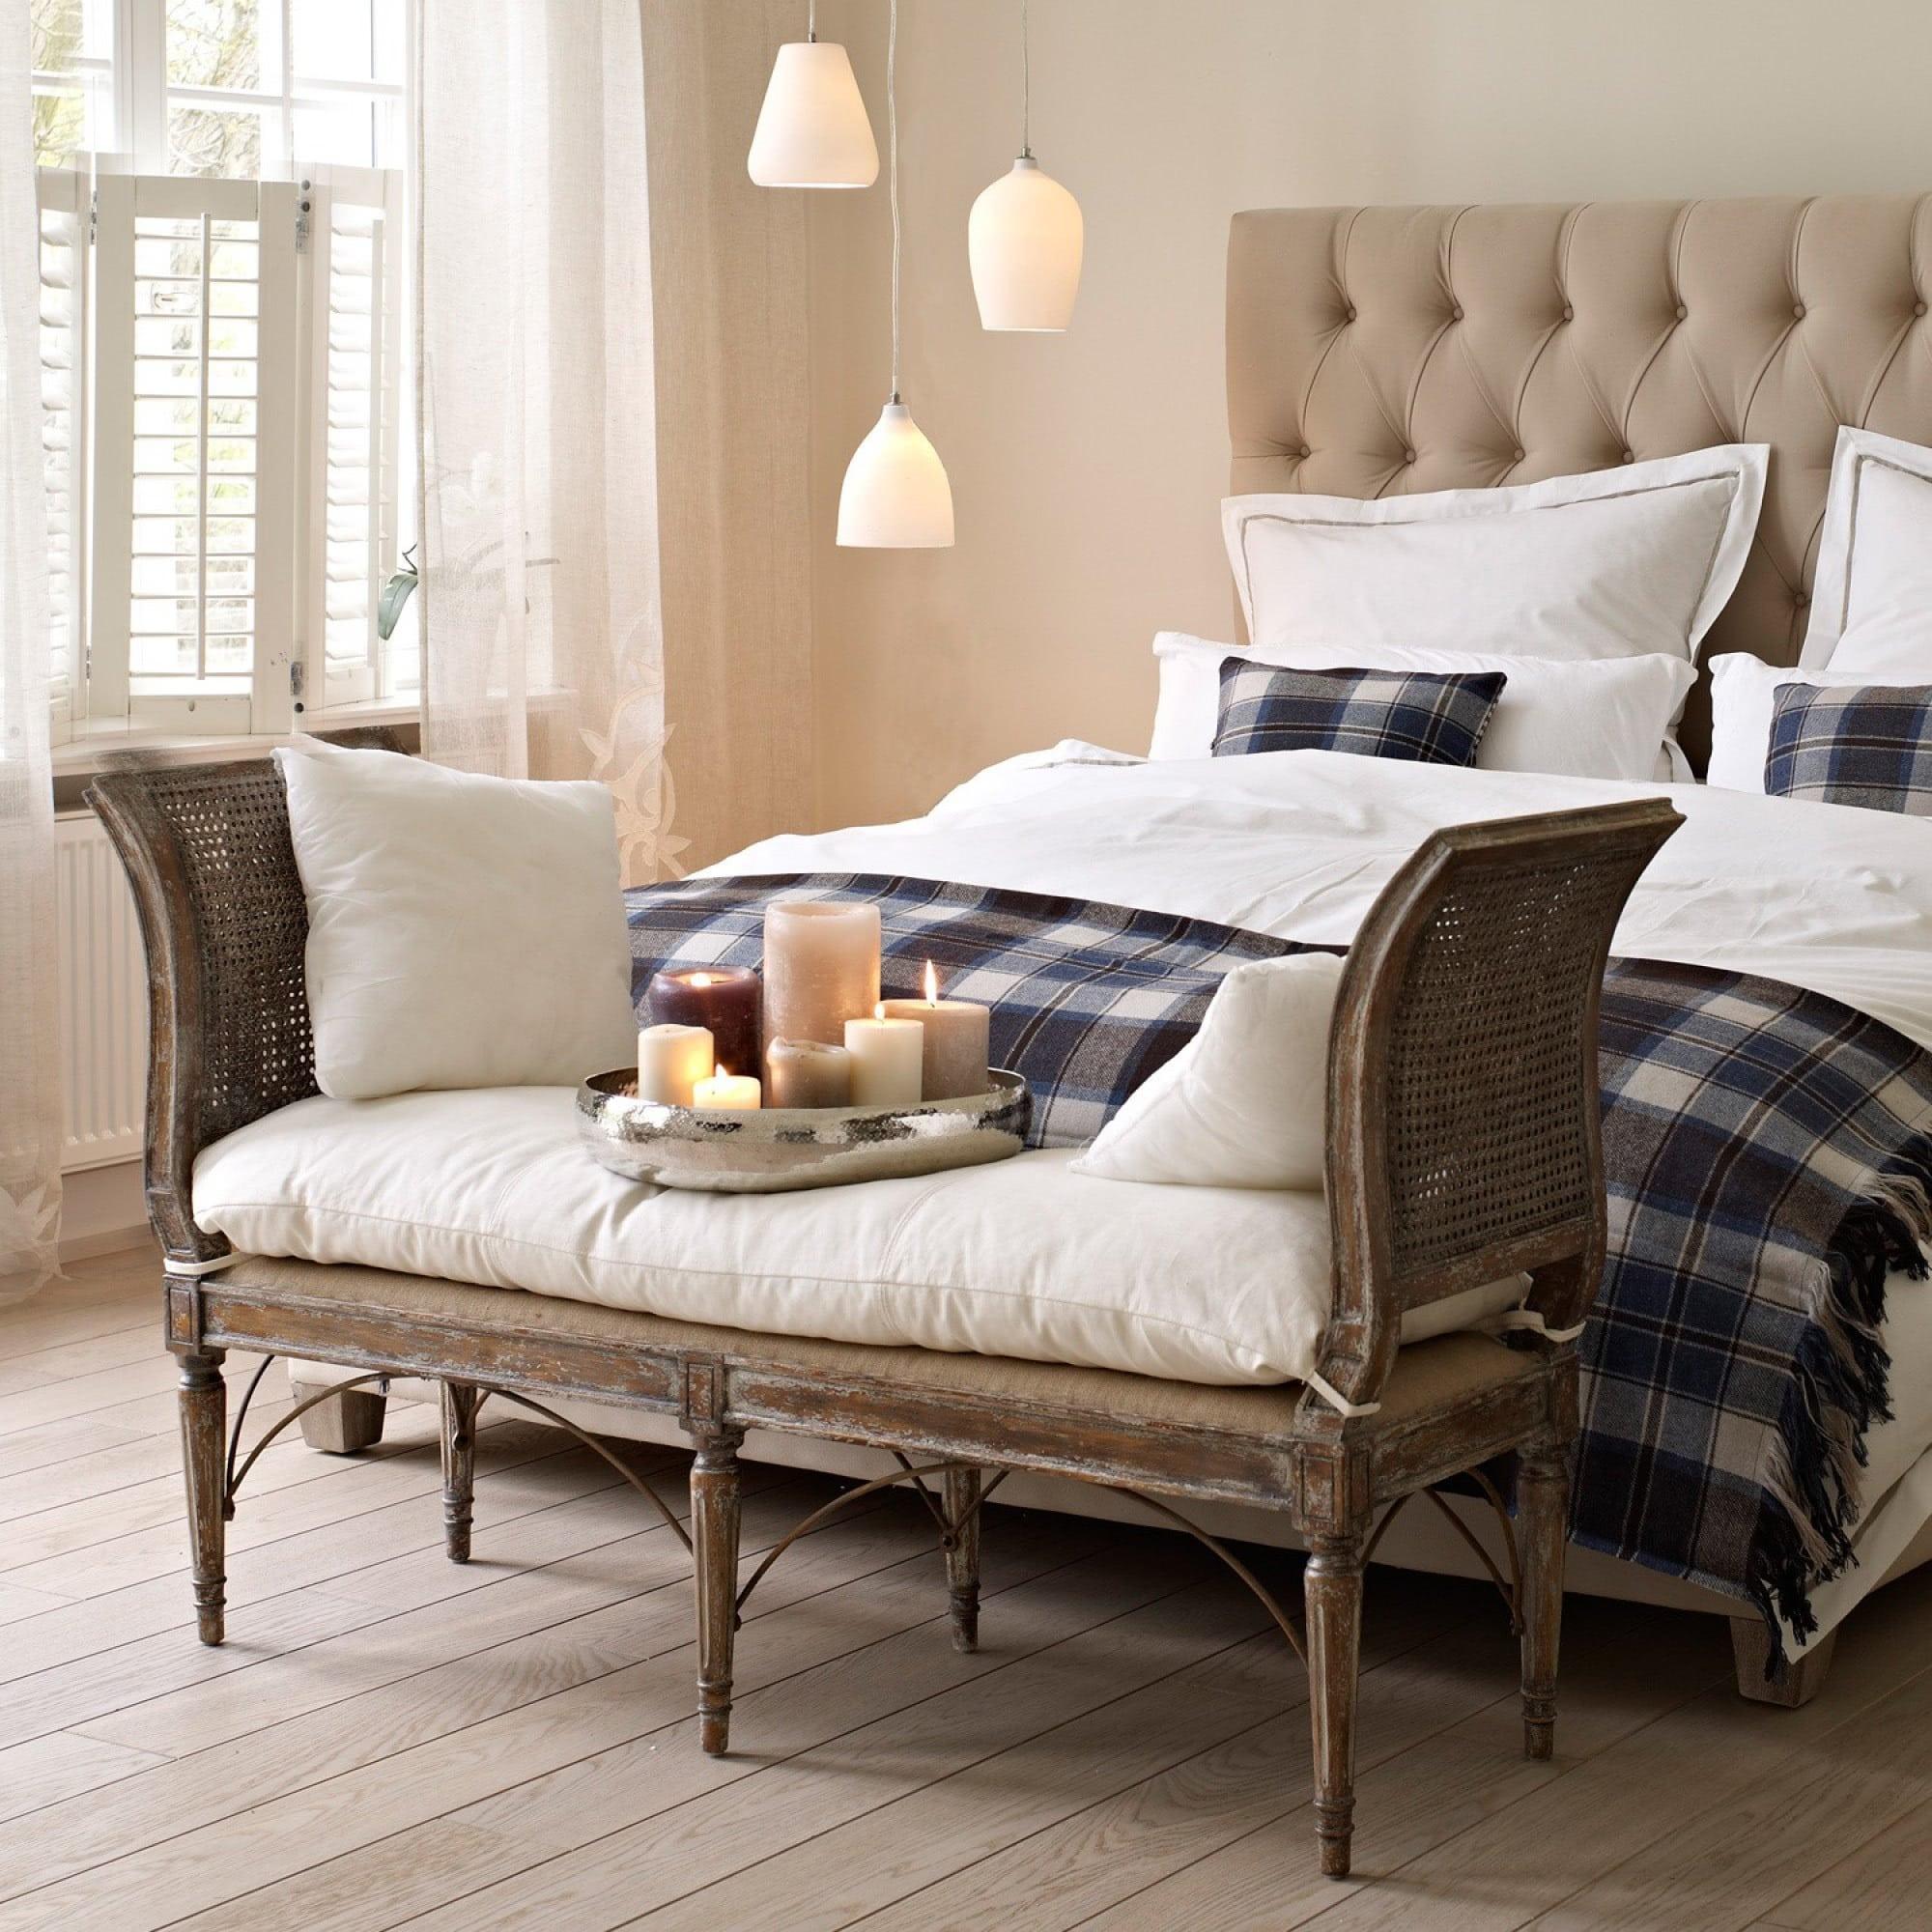 bank sibel loberon coming home. Black Bedroom Furniture Sets. Home Design Ideas